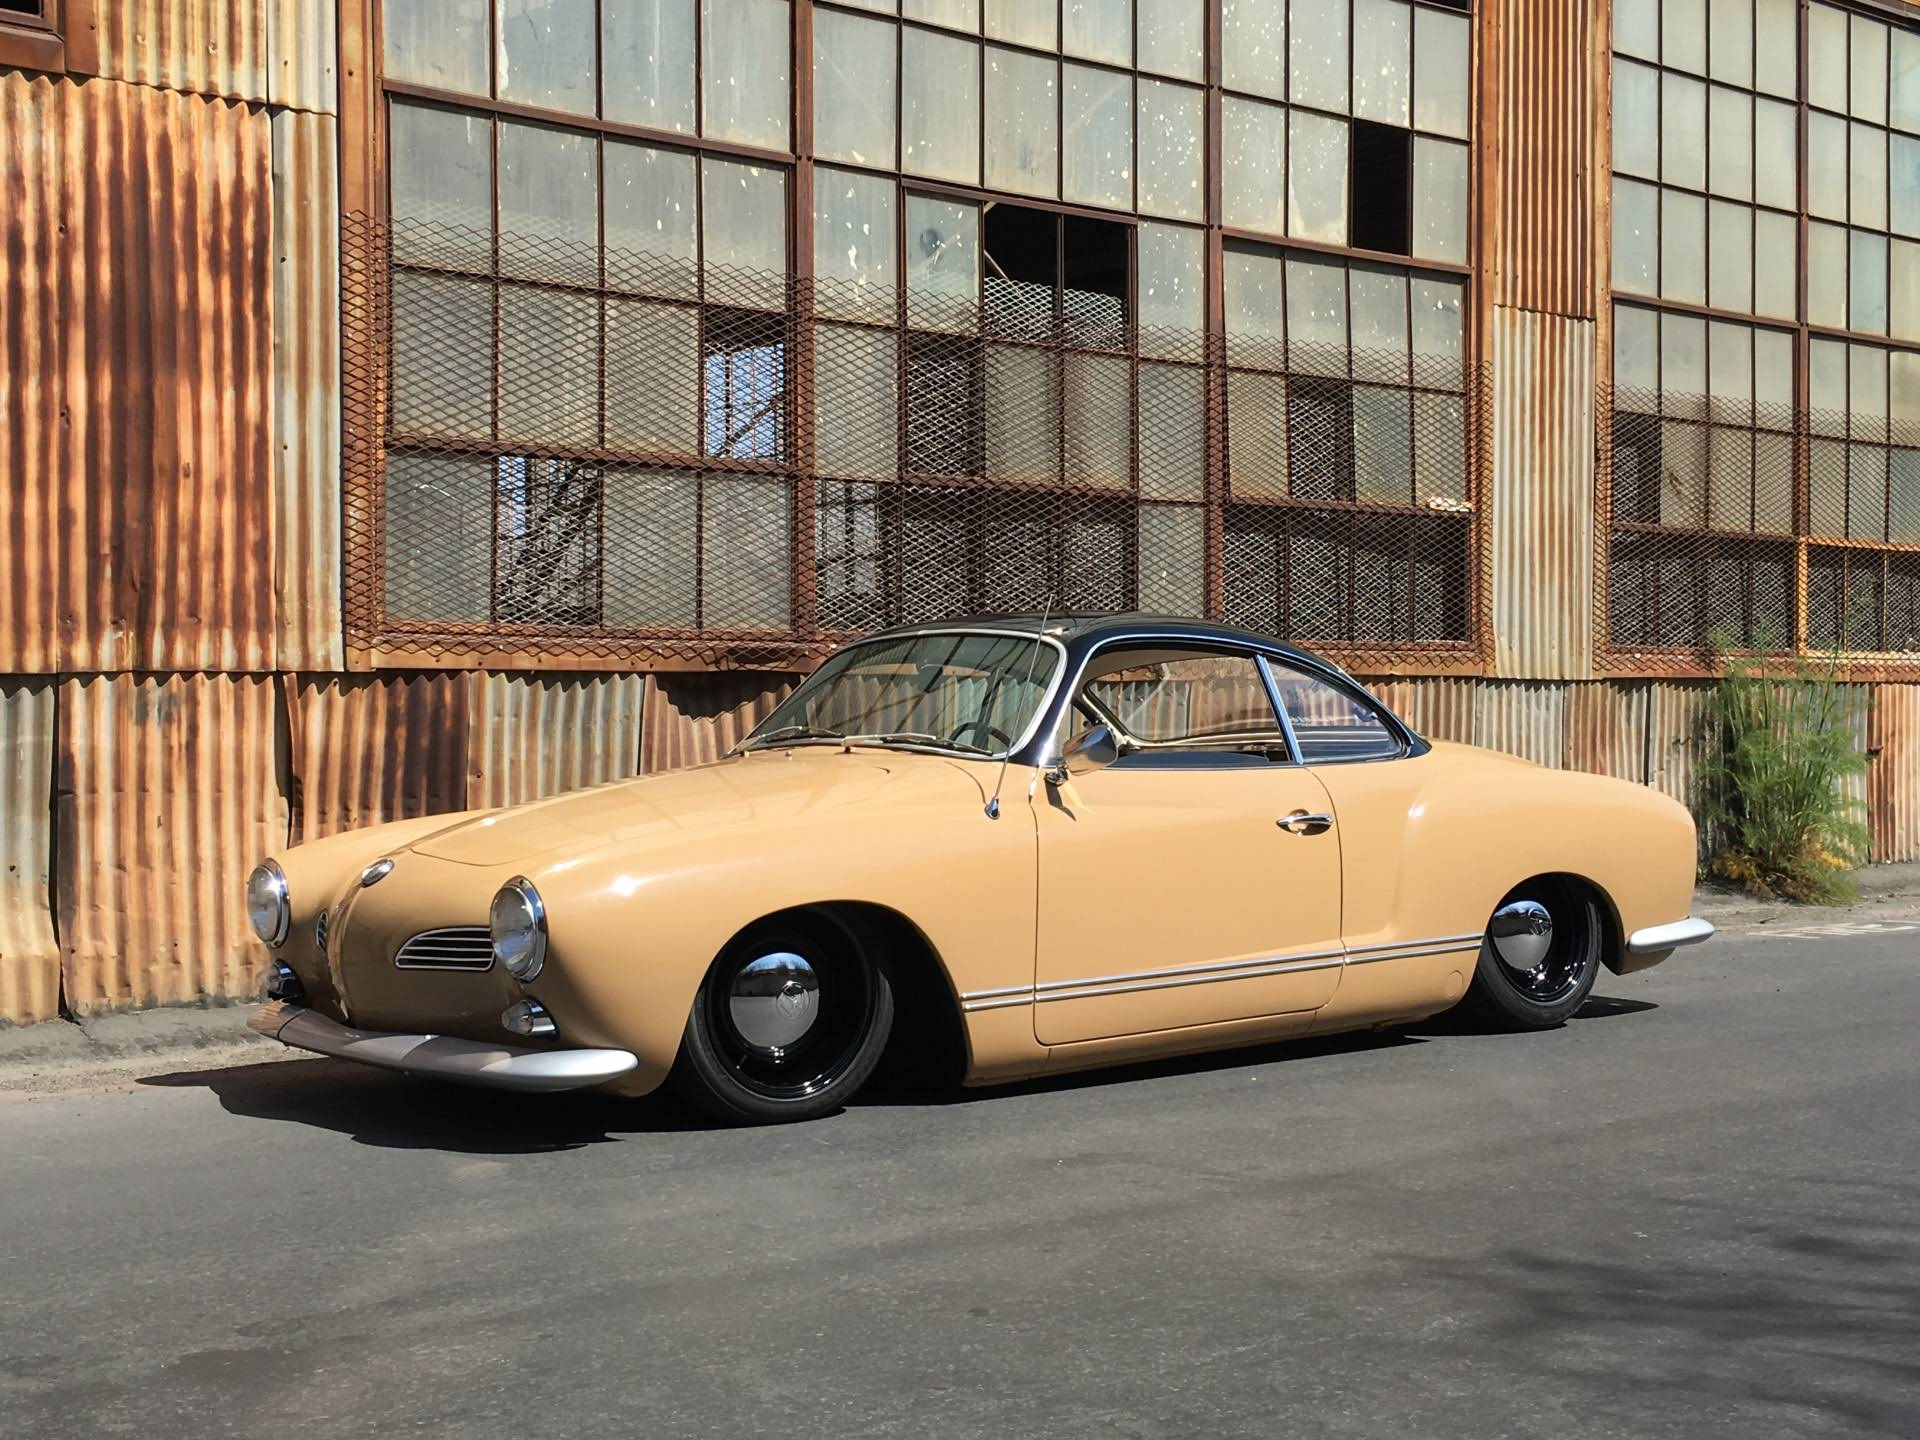 Pre-war and vintage car rental for weddings - BookAclassic.us